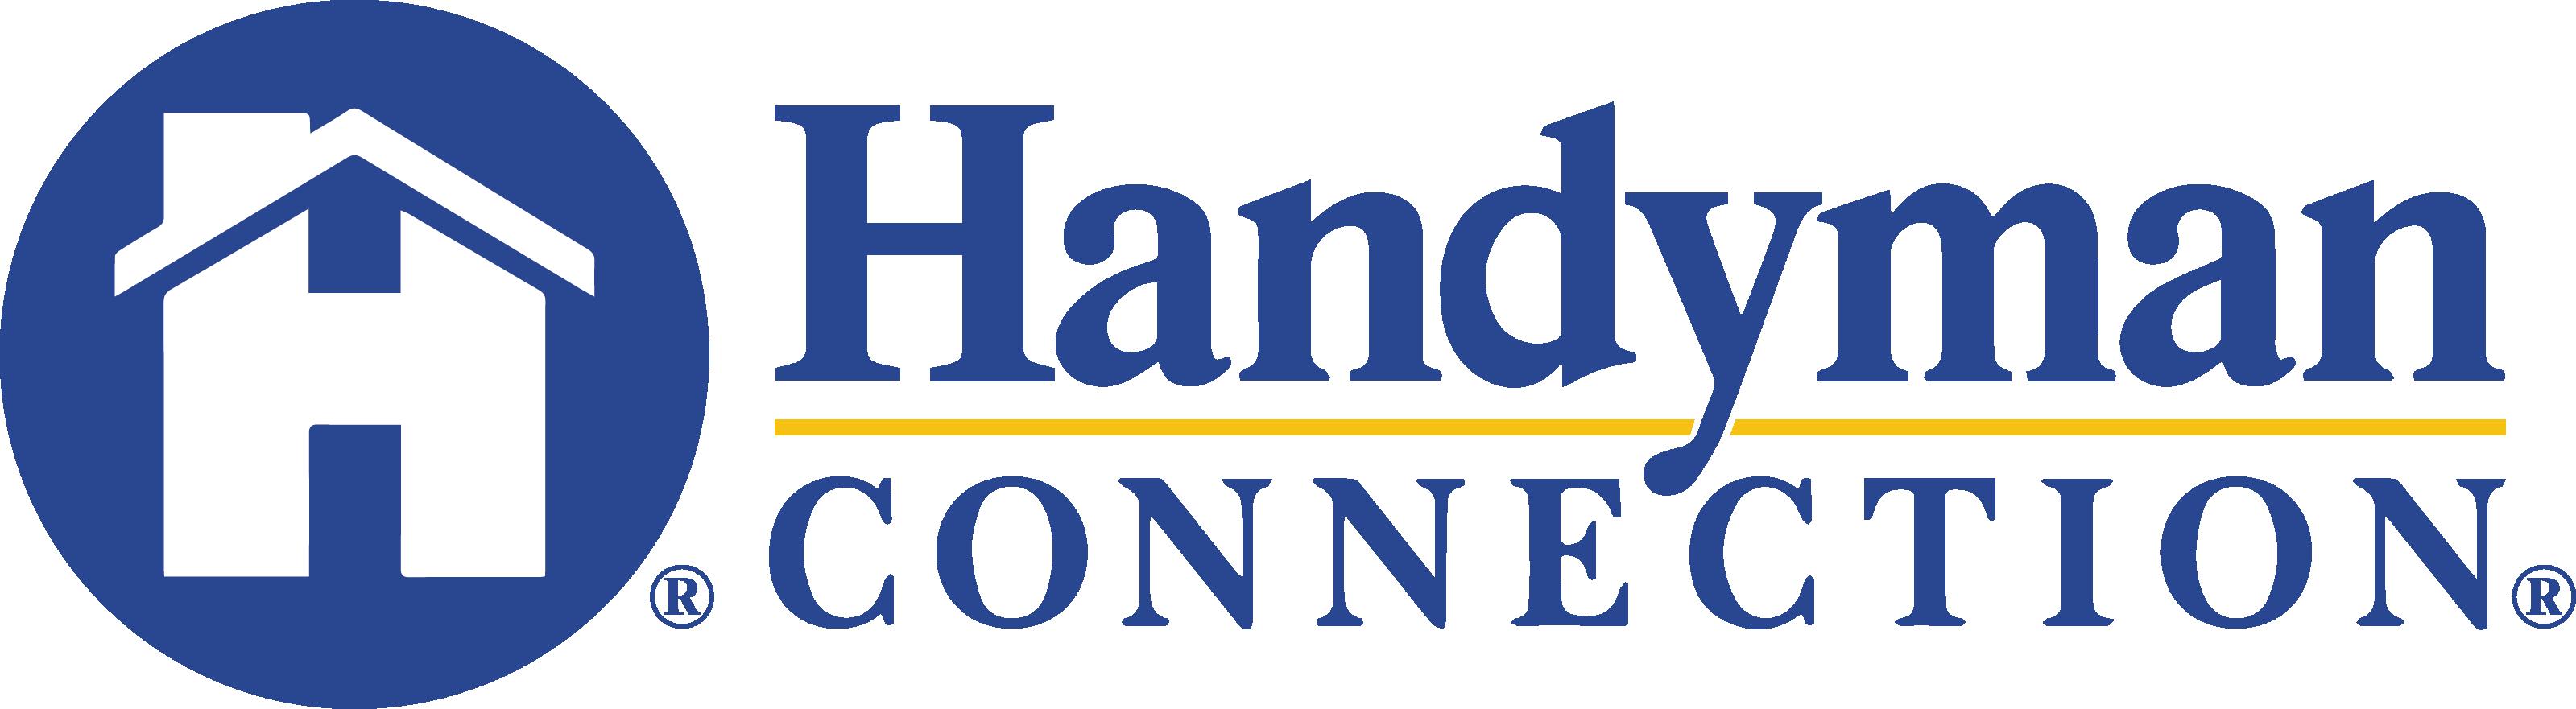 Handyman Connection of Kelowna